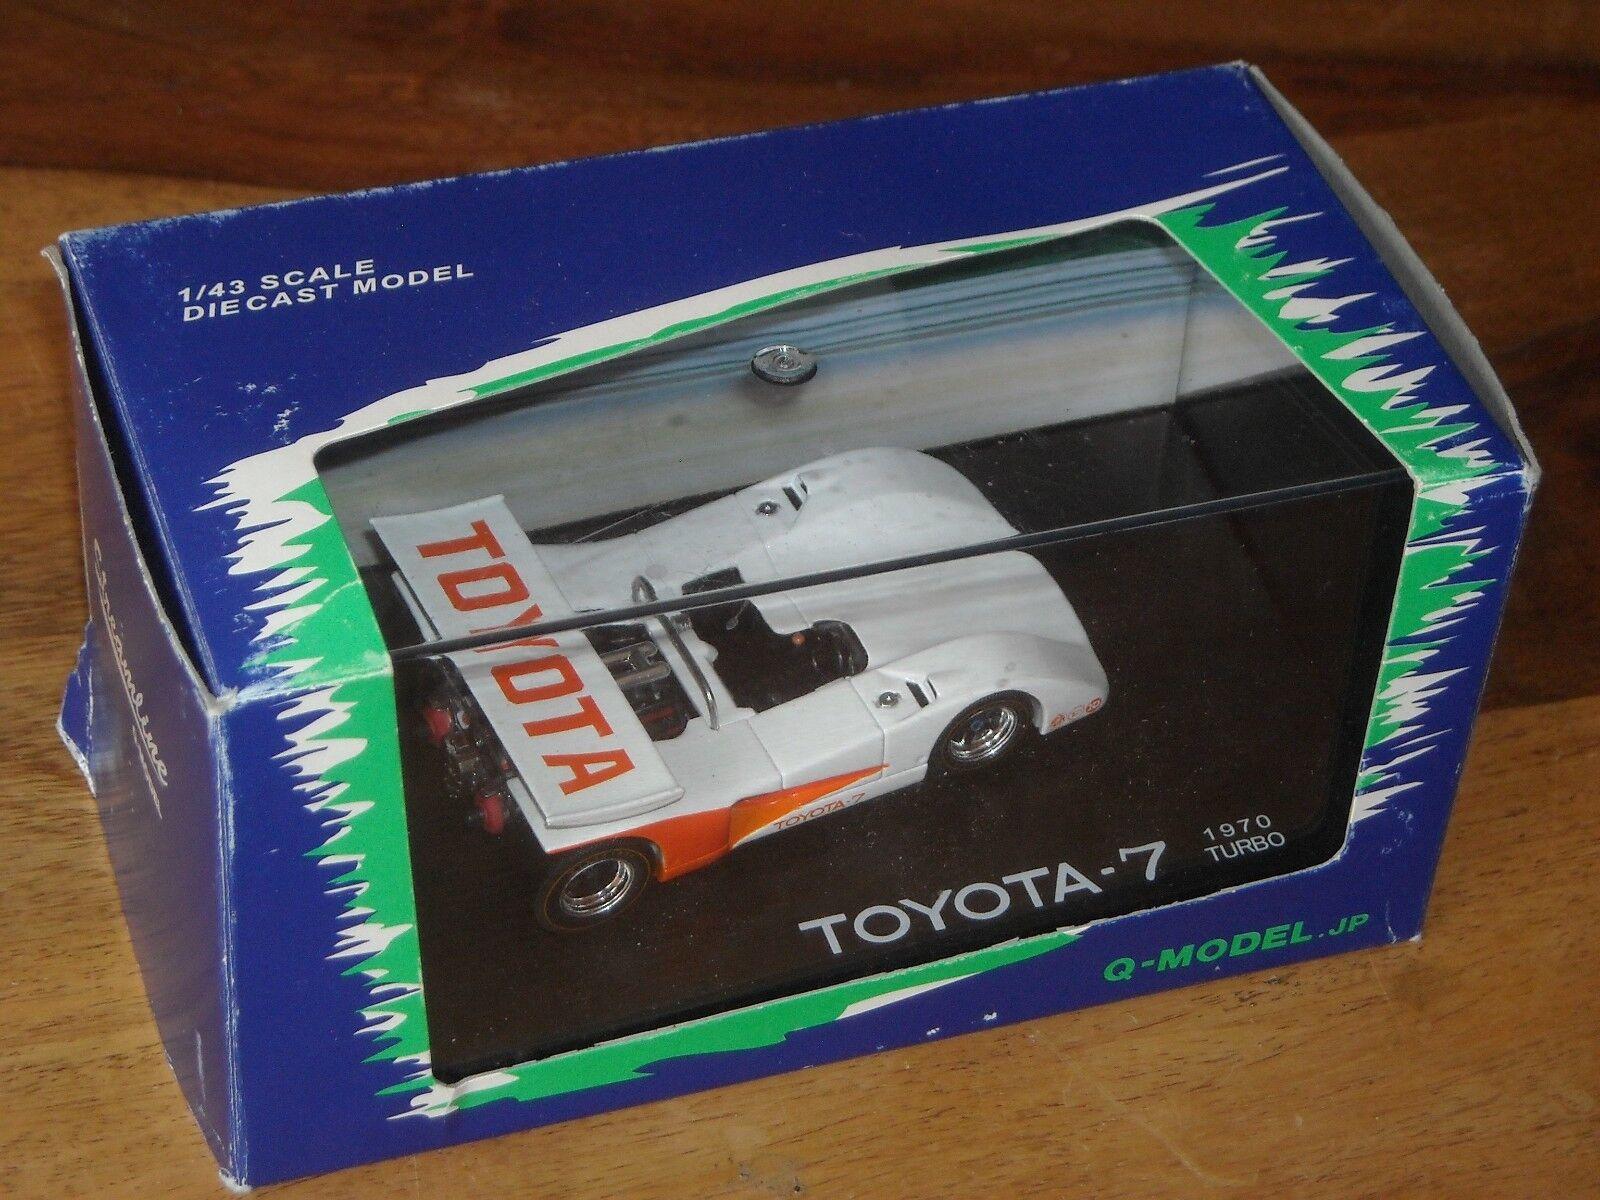 Q-Model Streamline QMC-007 white orange Toyota-7 1970 Turbo S.Hosoya 1 43